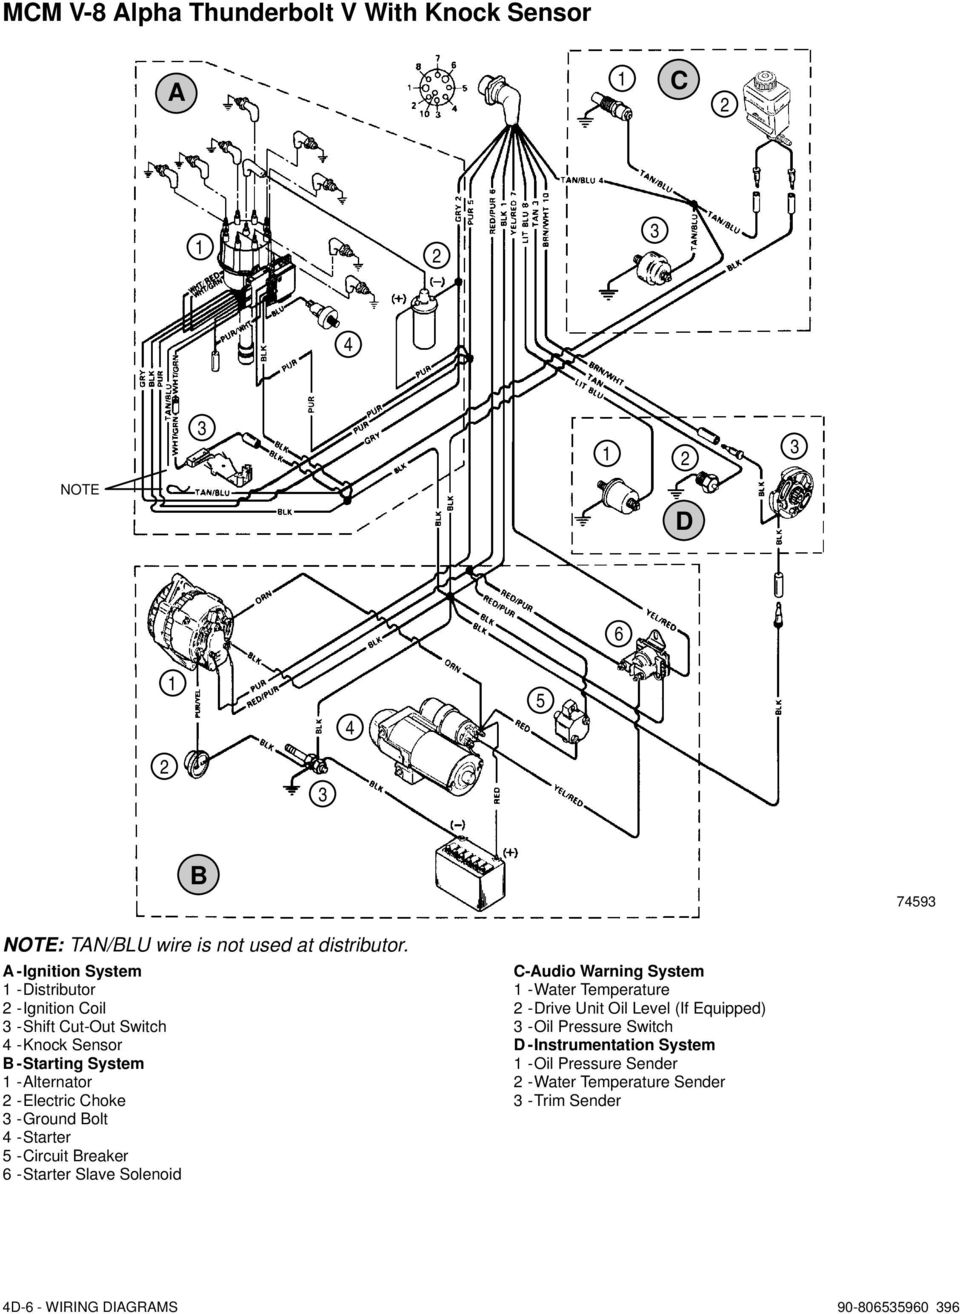 medium resolution of  ground olt starter ircuit reaker starter slave solenoid udio warning system